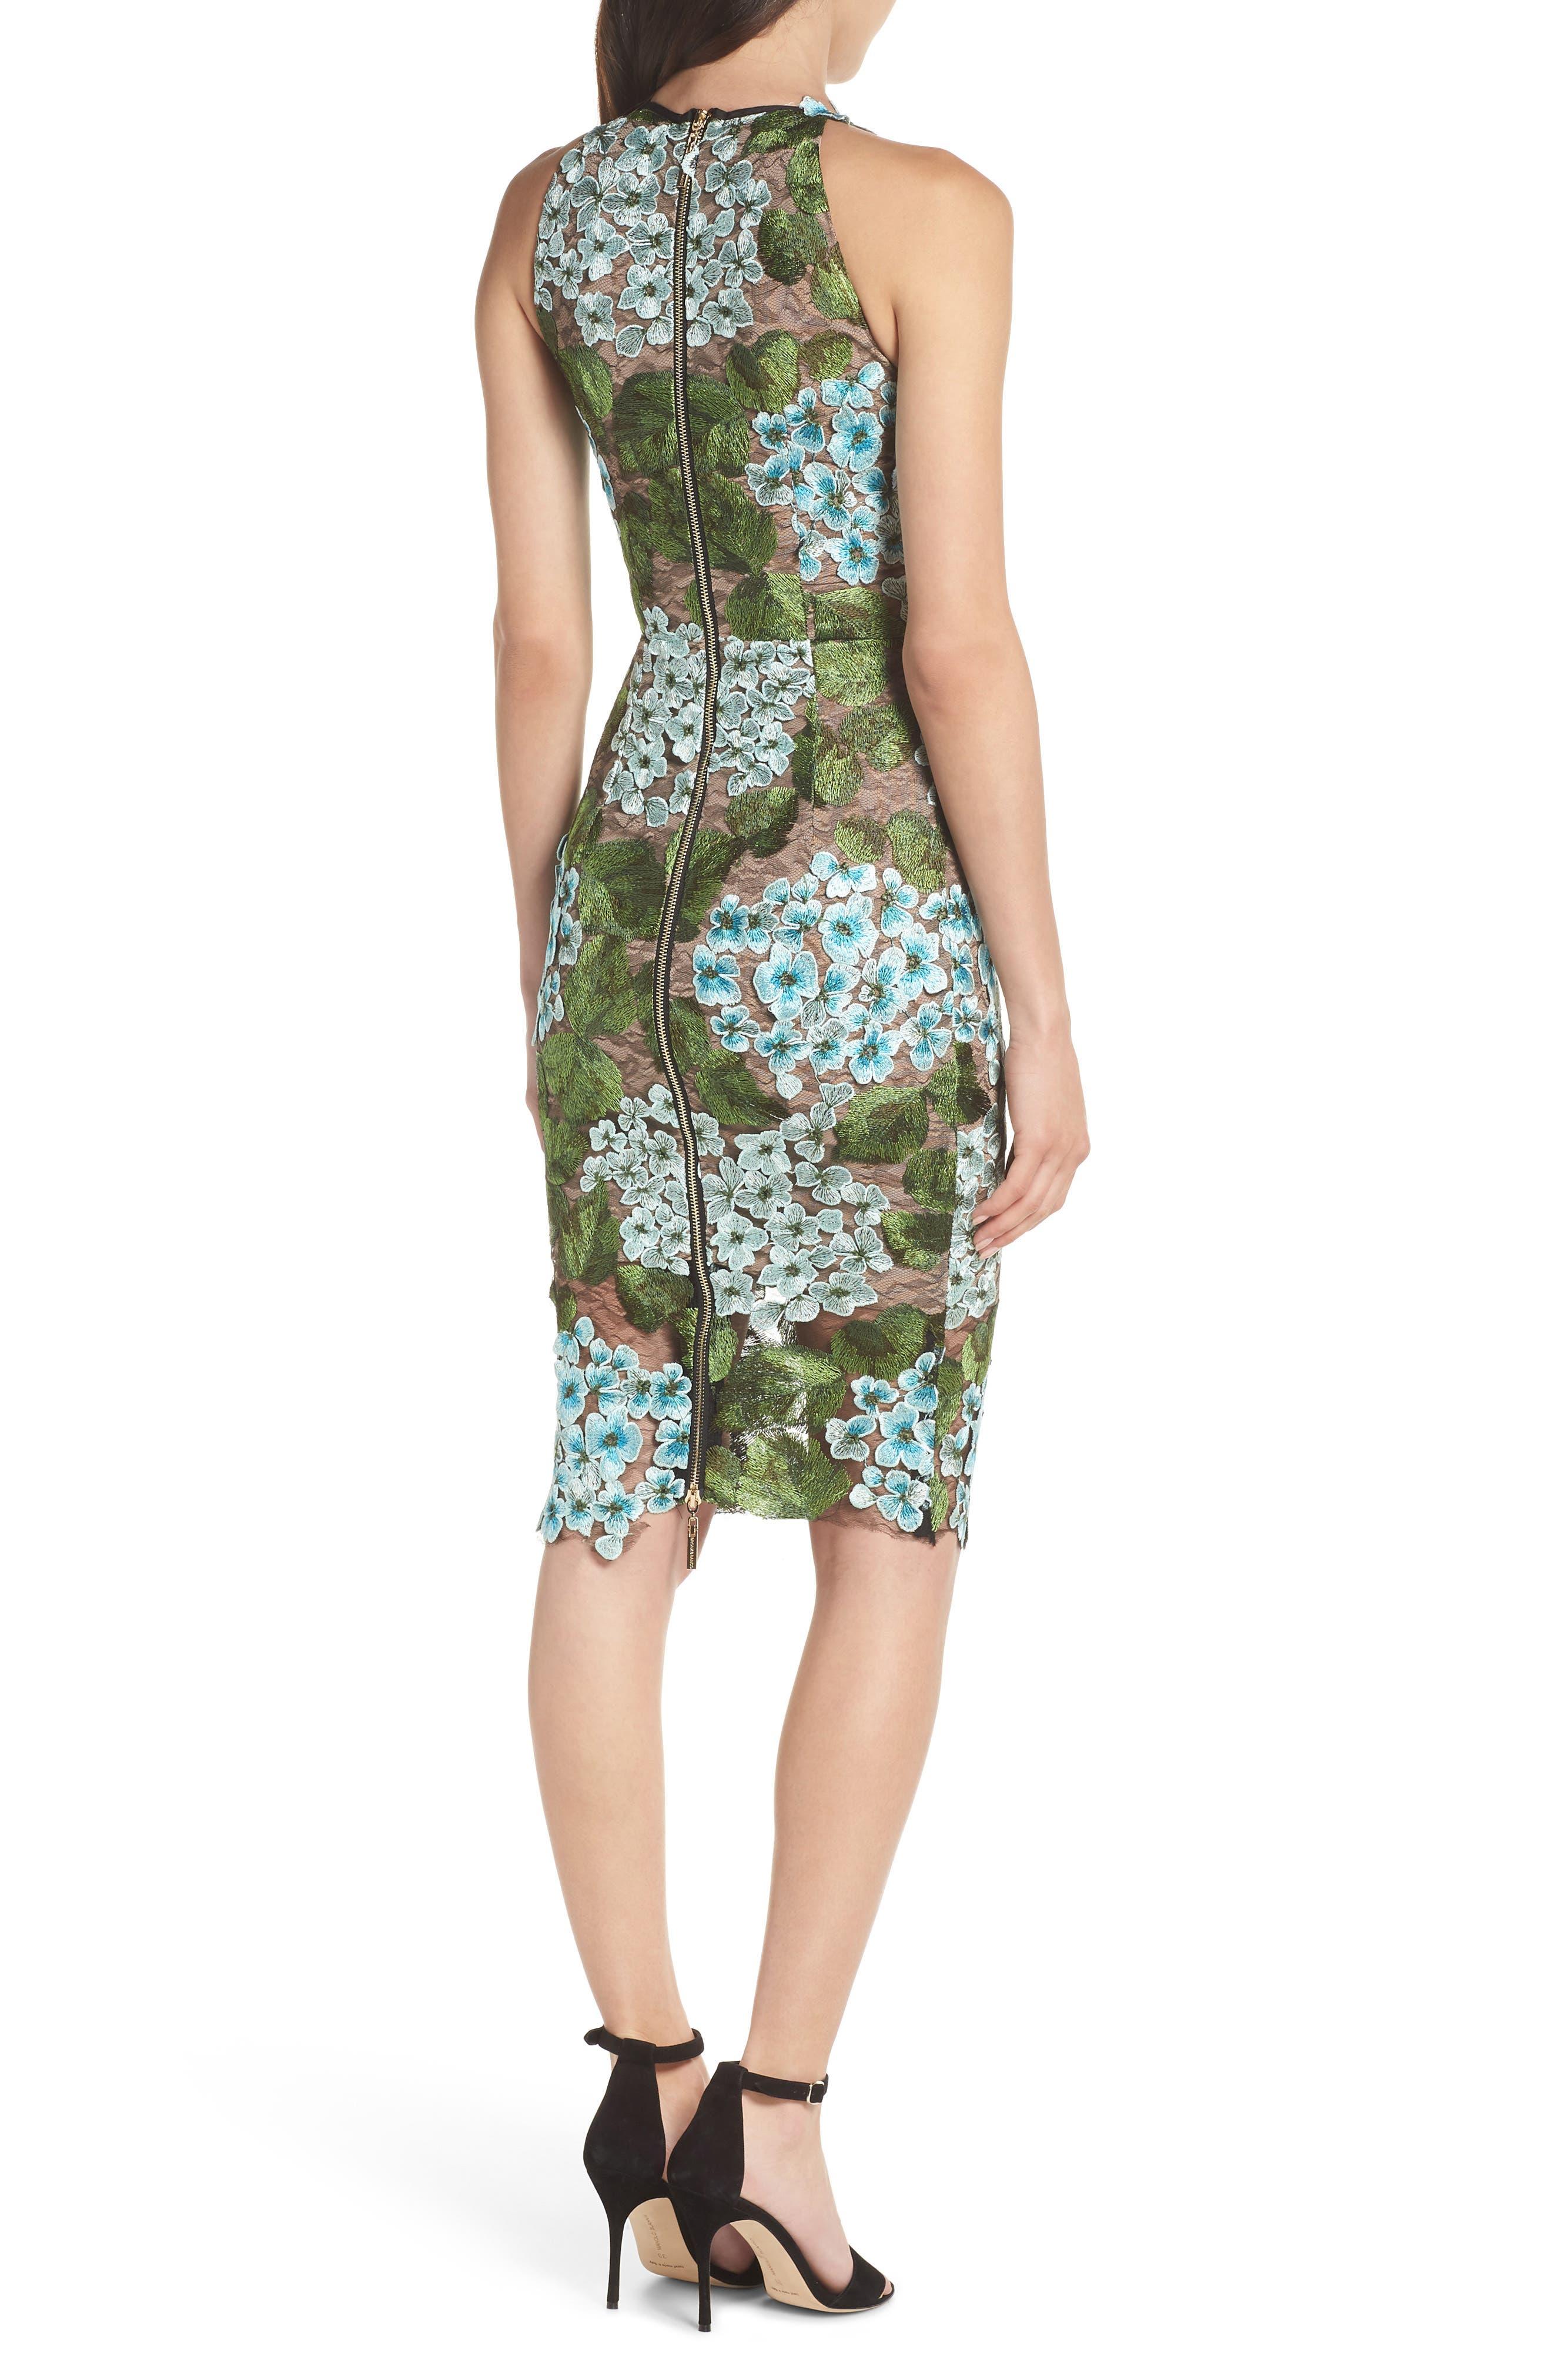 Blue Cherry Hydrangea Lace Sheath Dress,                             Alternate thumbnail 2, color,                             Multicolor